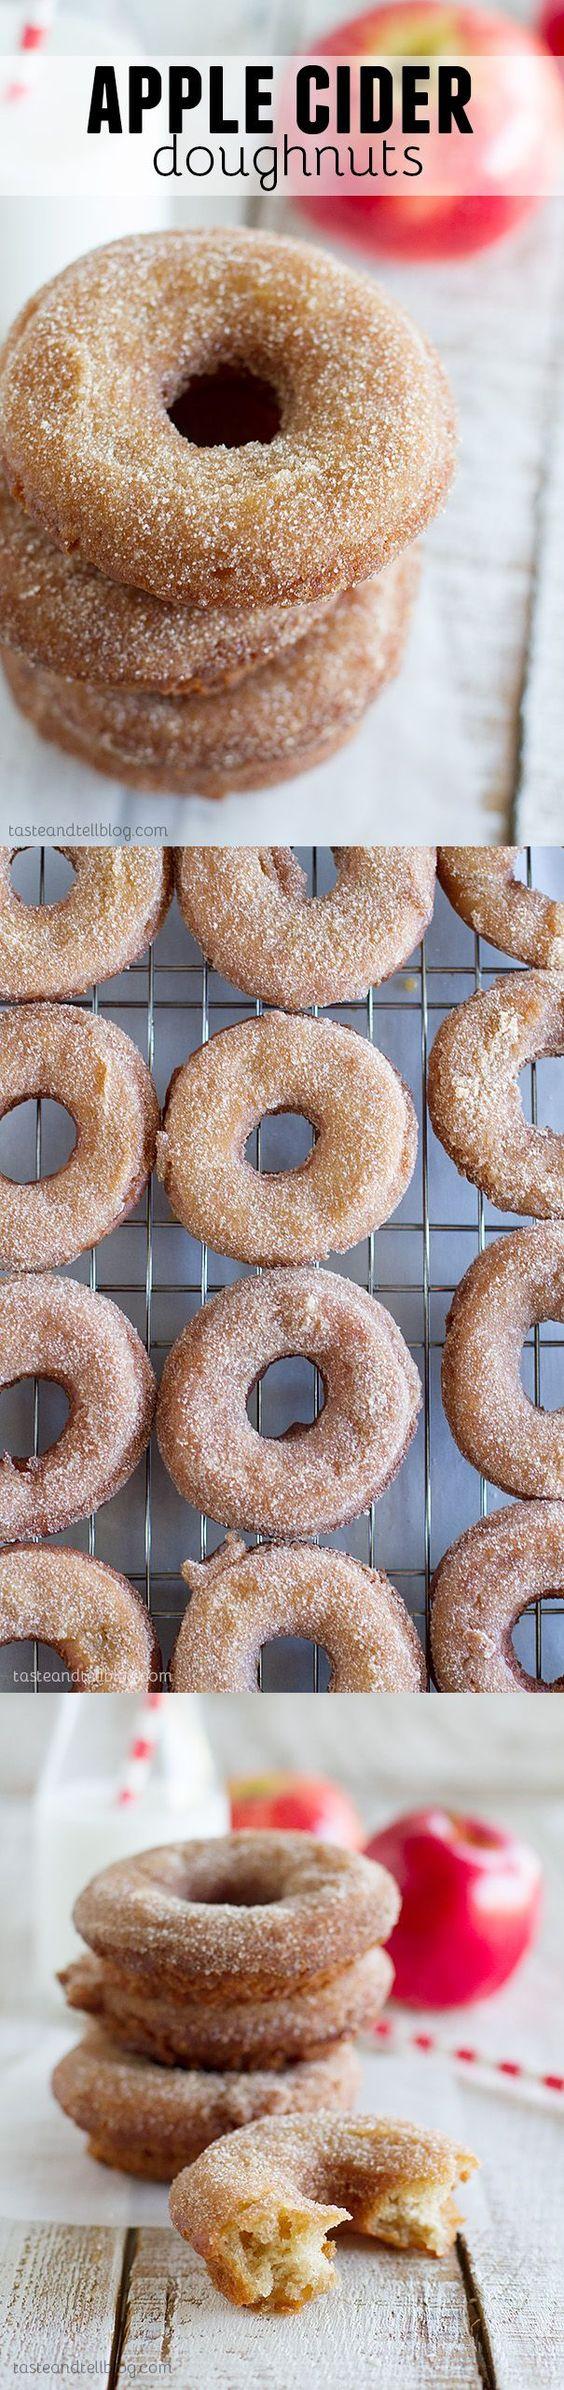 ... doughnuts buttermilk apple cider doughnuts baked apple cider doughnut